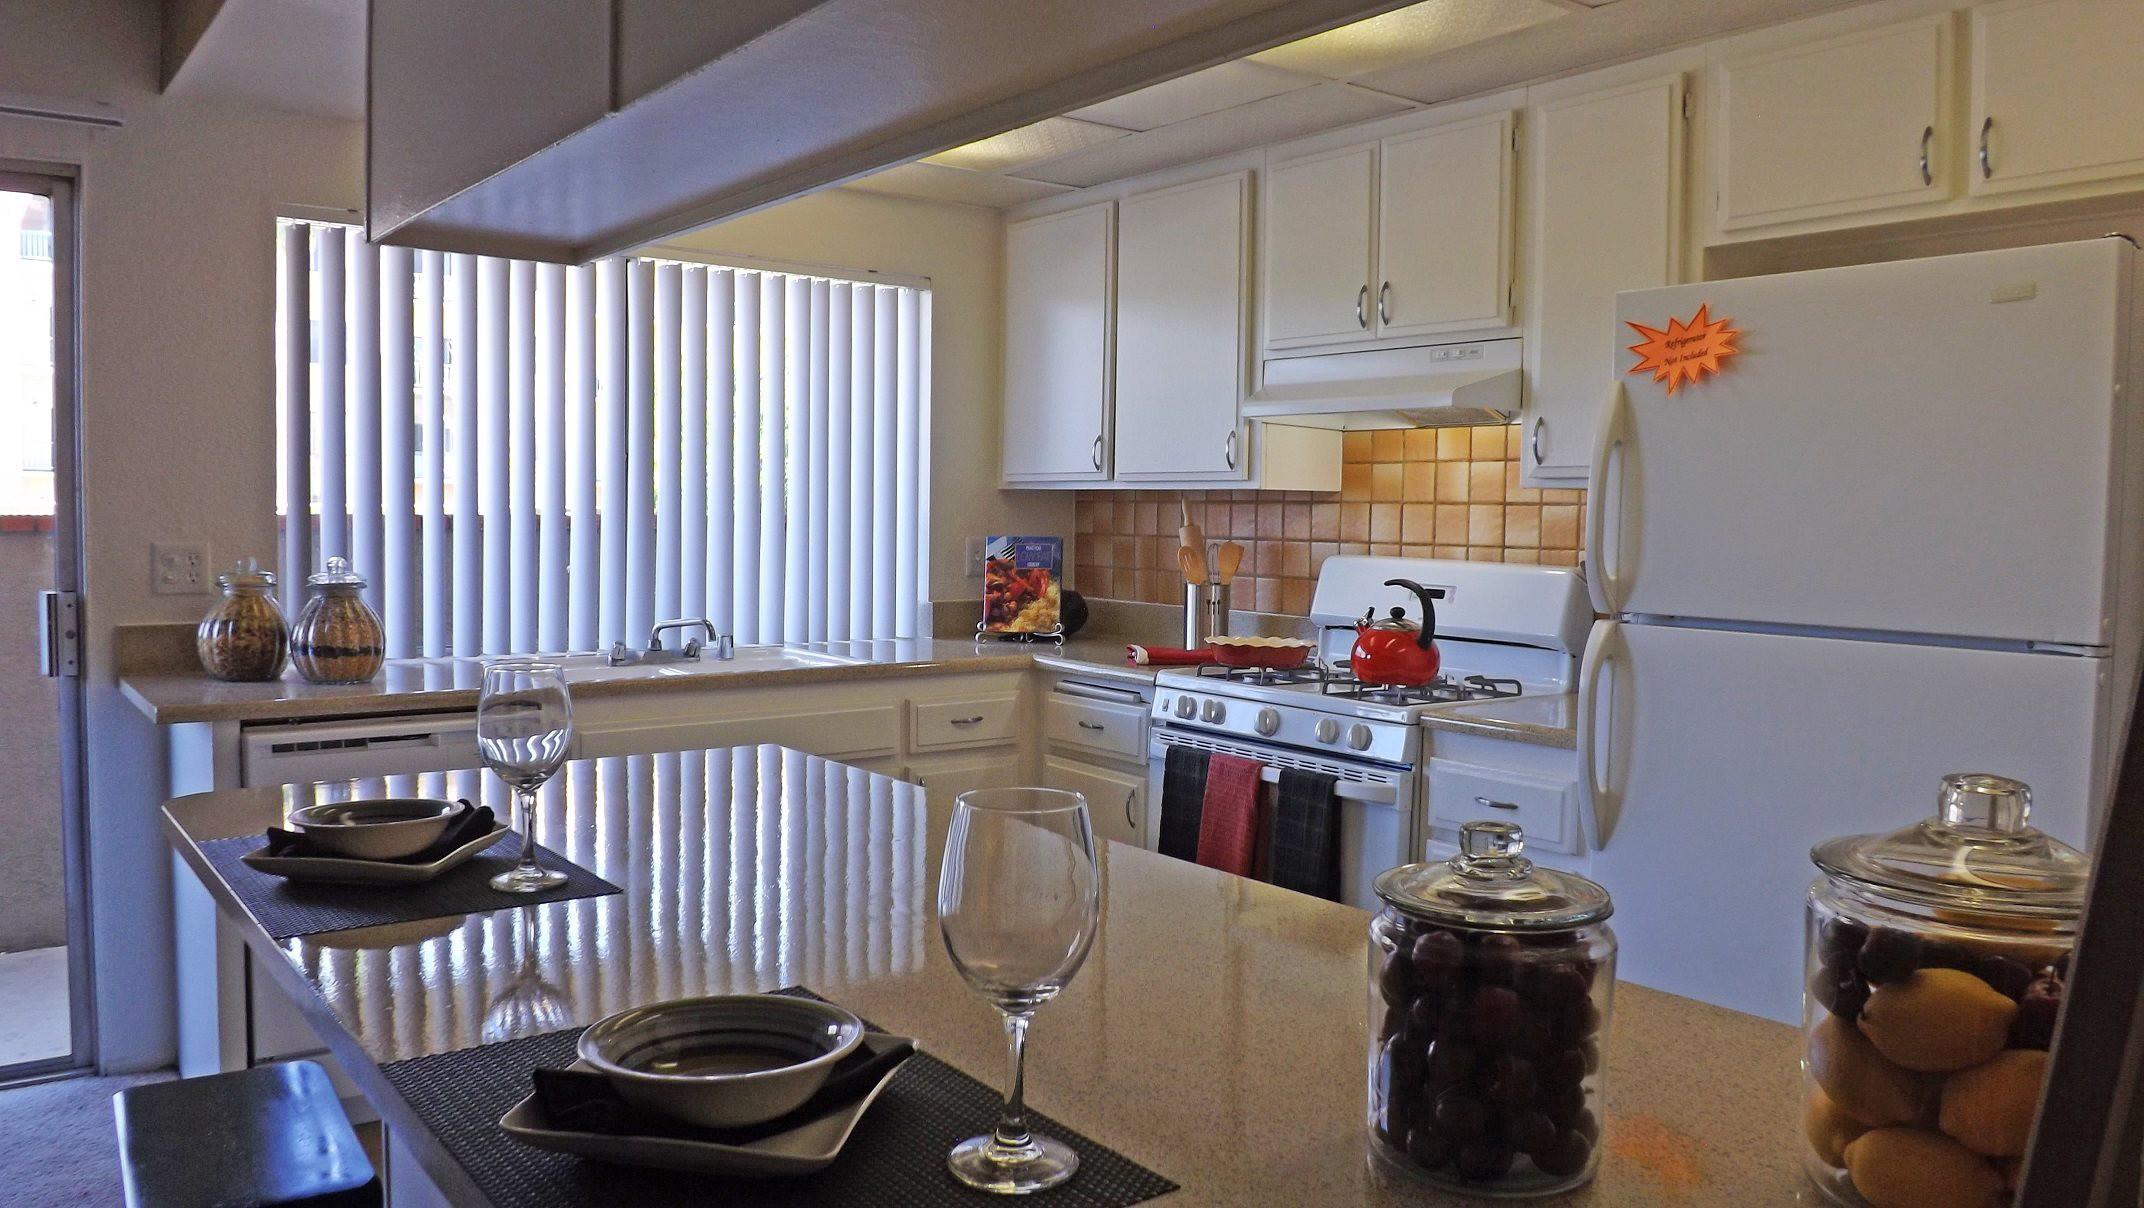 Apartments Near MSJC Amberwood Villas for Mt. San Jacinto College Students in San Jacinto, CA